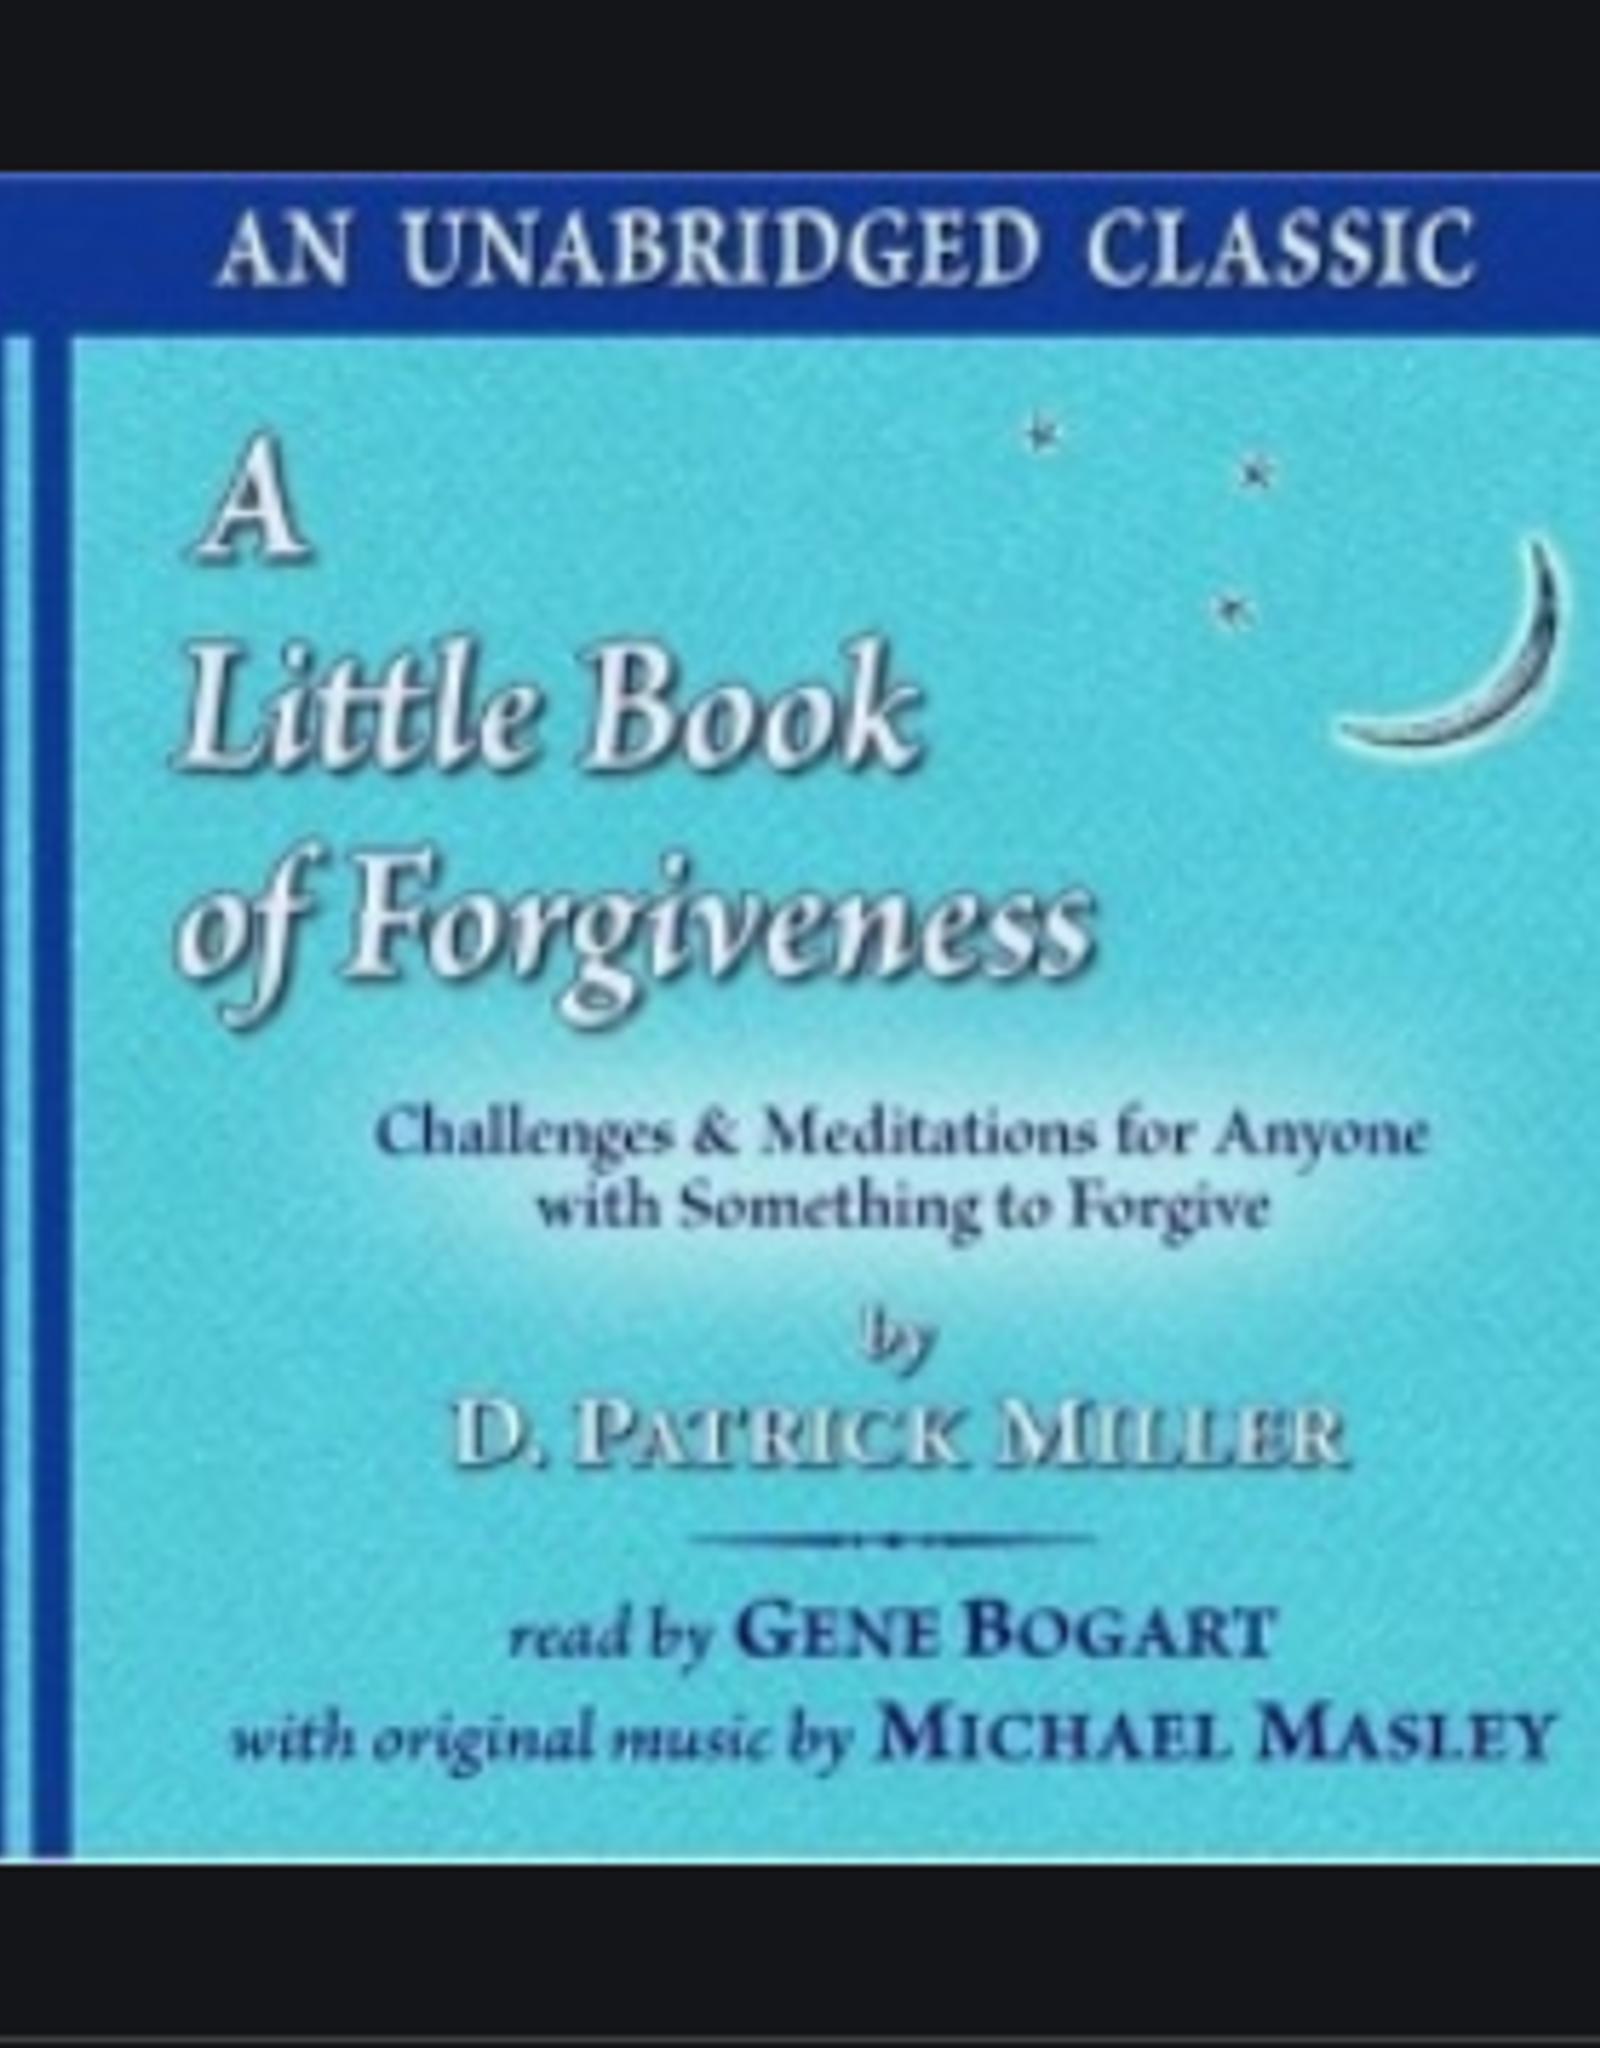 D. Patrick Miller A Little Book of Forgiveness CD by D. Patrick Miller